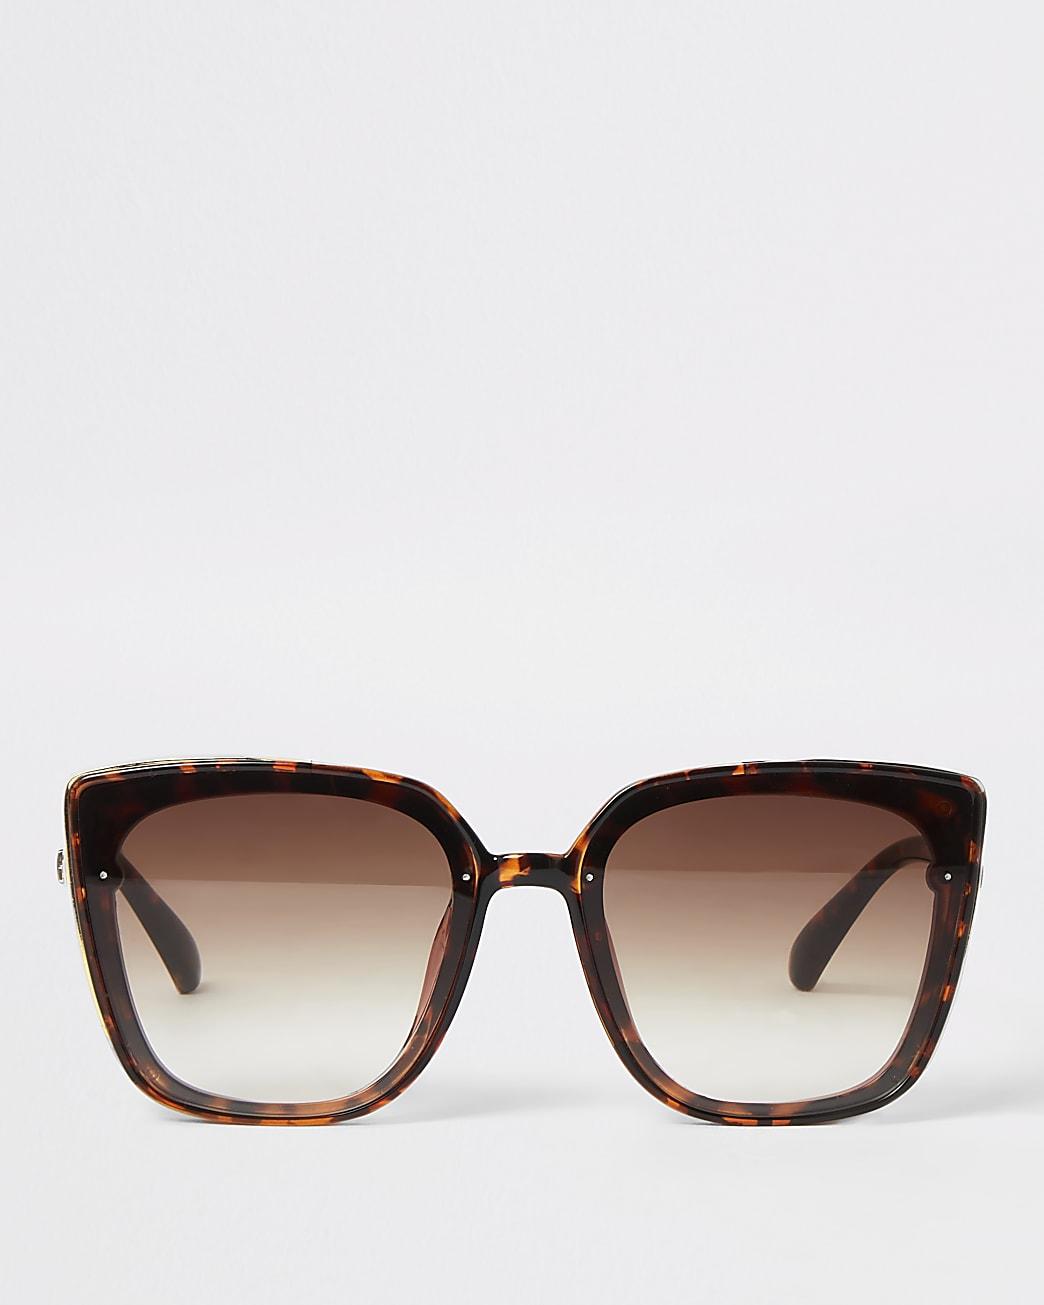 Brown tortoiseshell gold side glam sunglasses